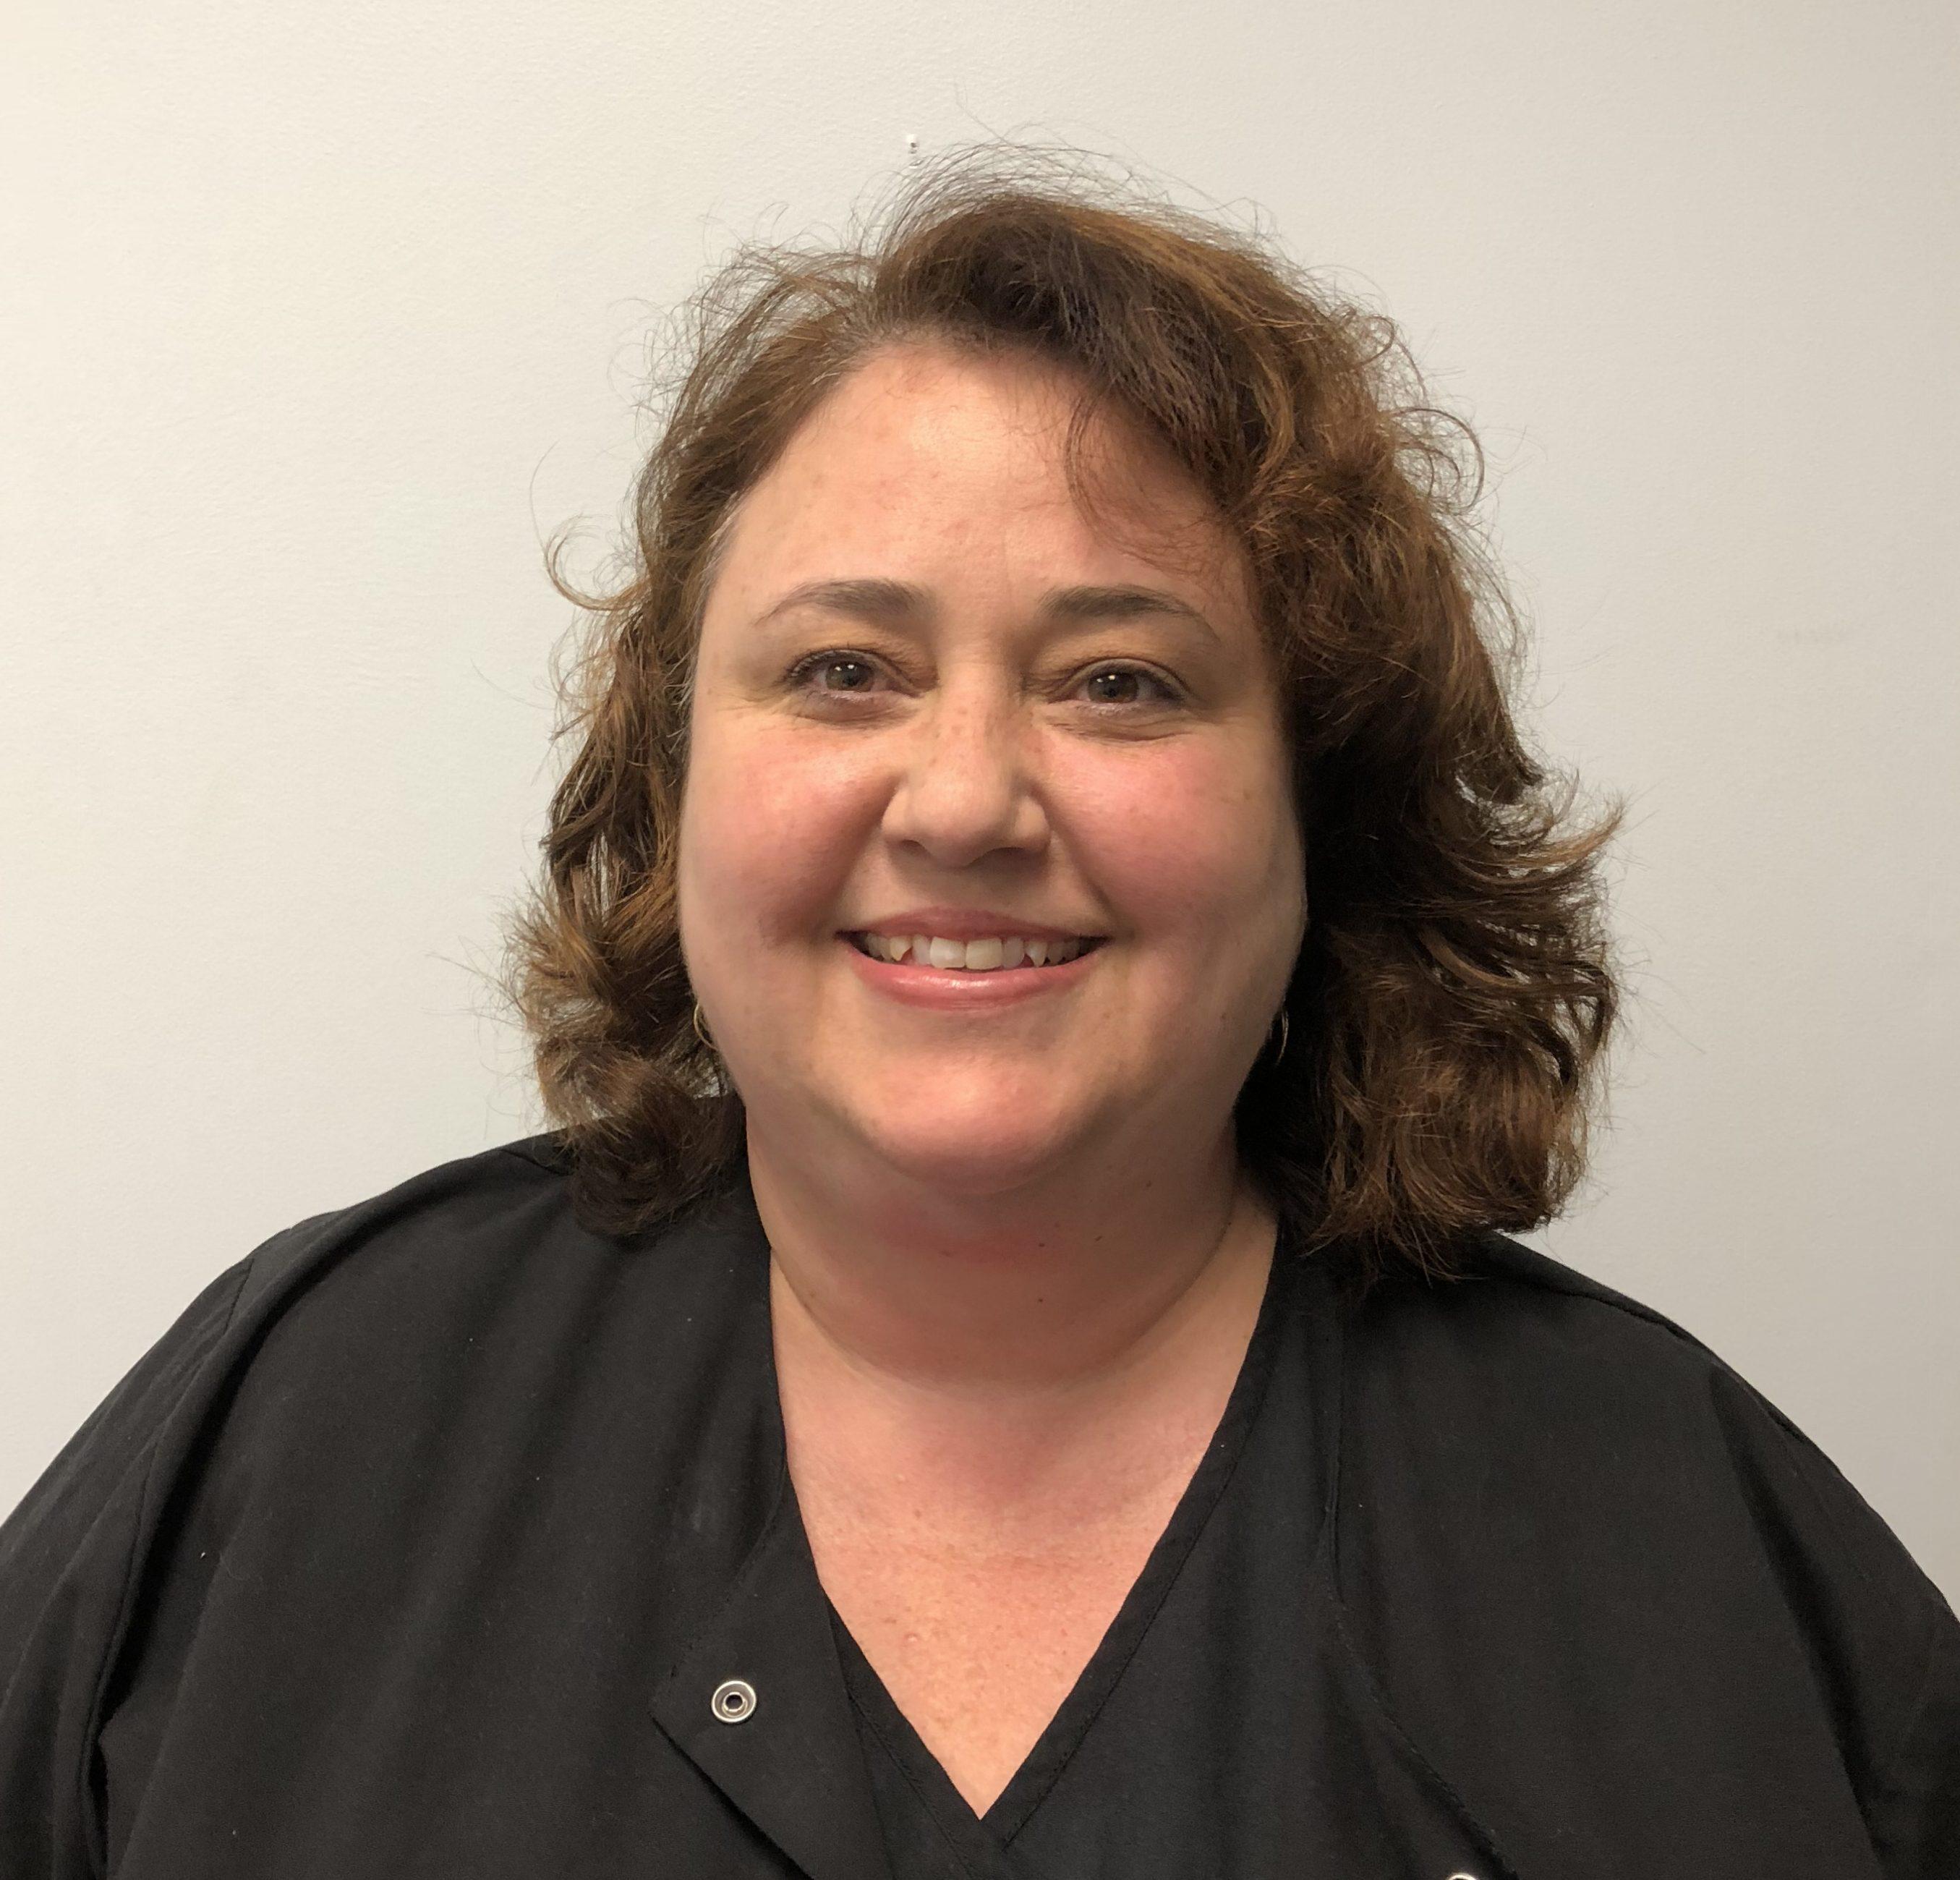 Our Clinical Personnel | Chapel Hill Pediatrics